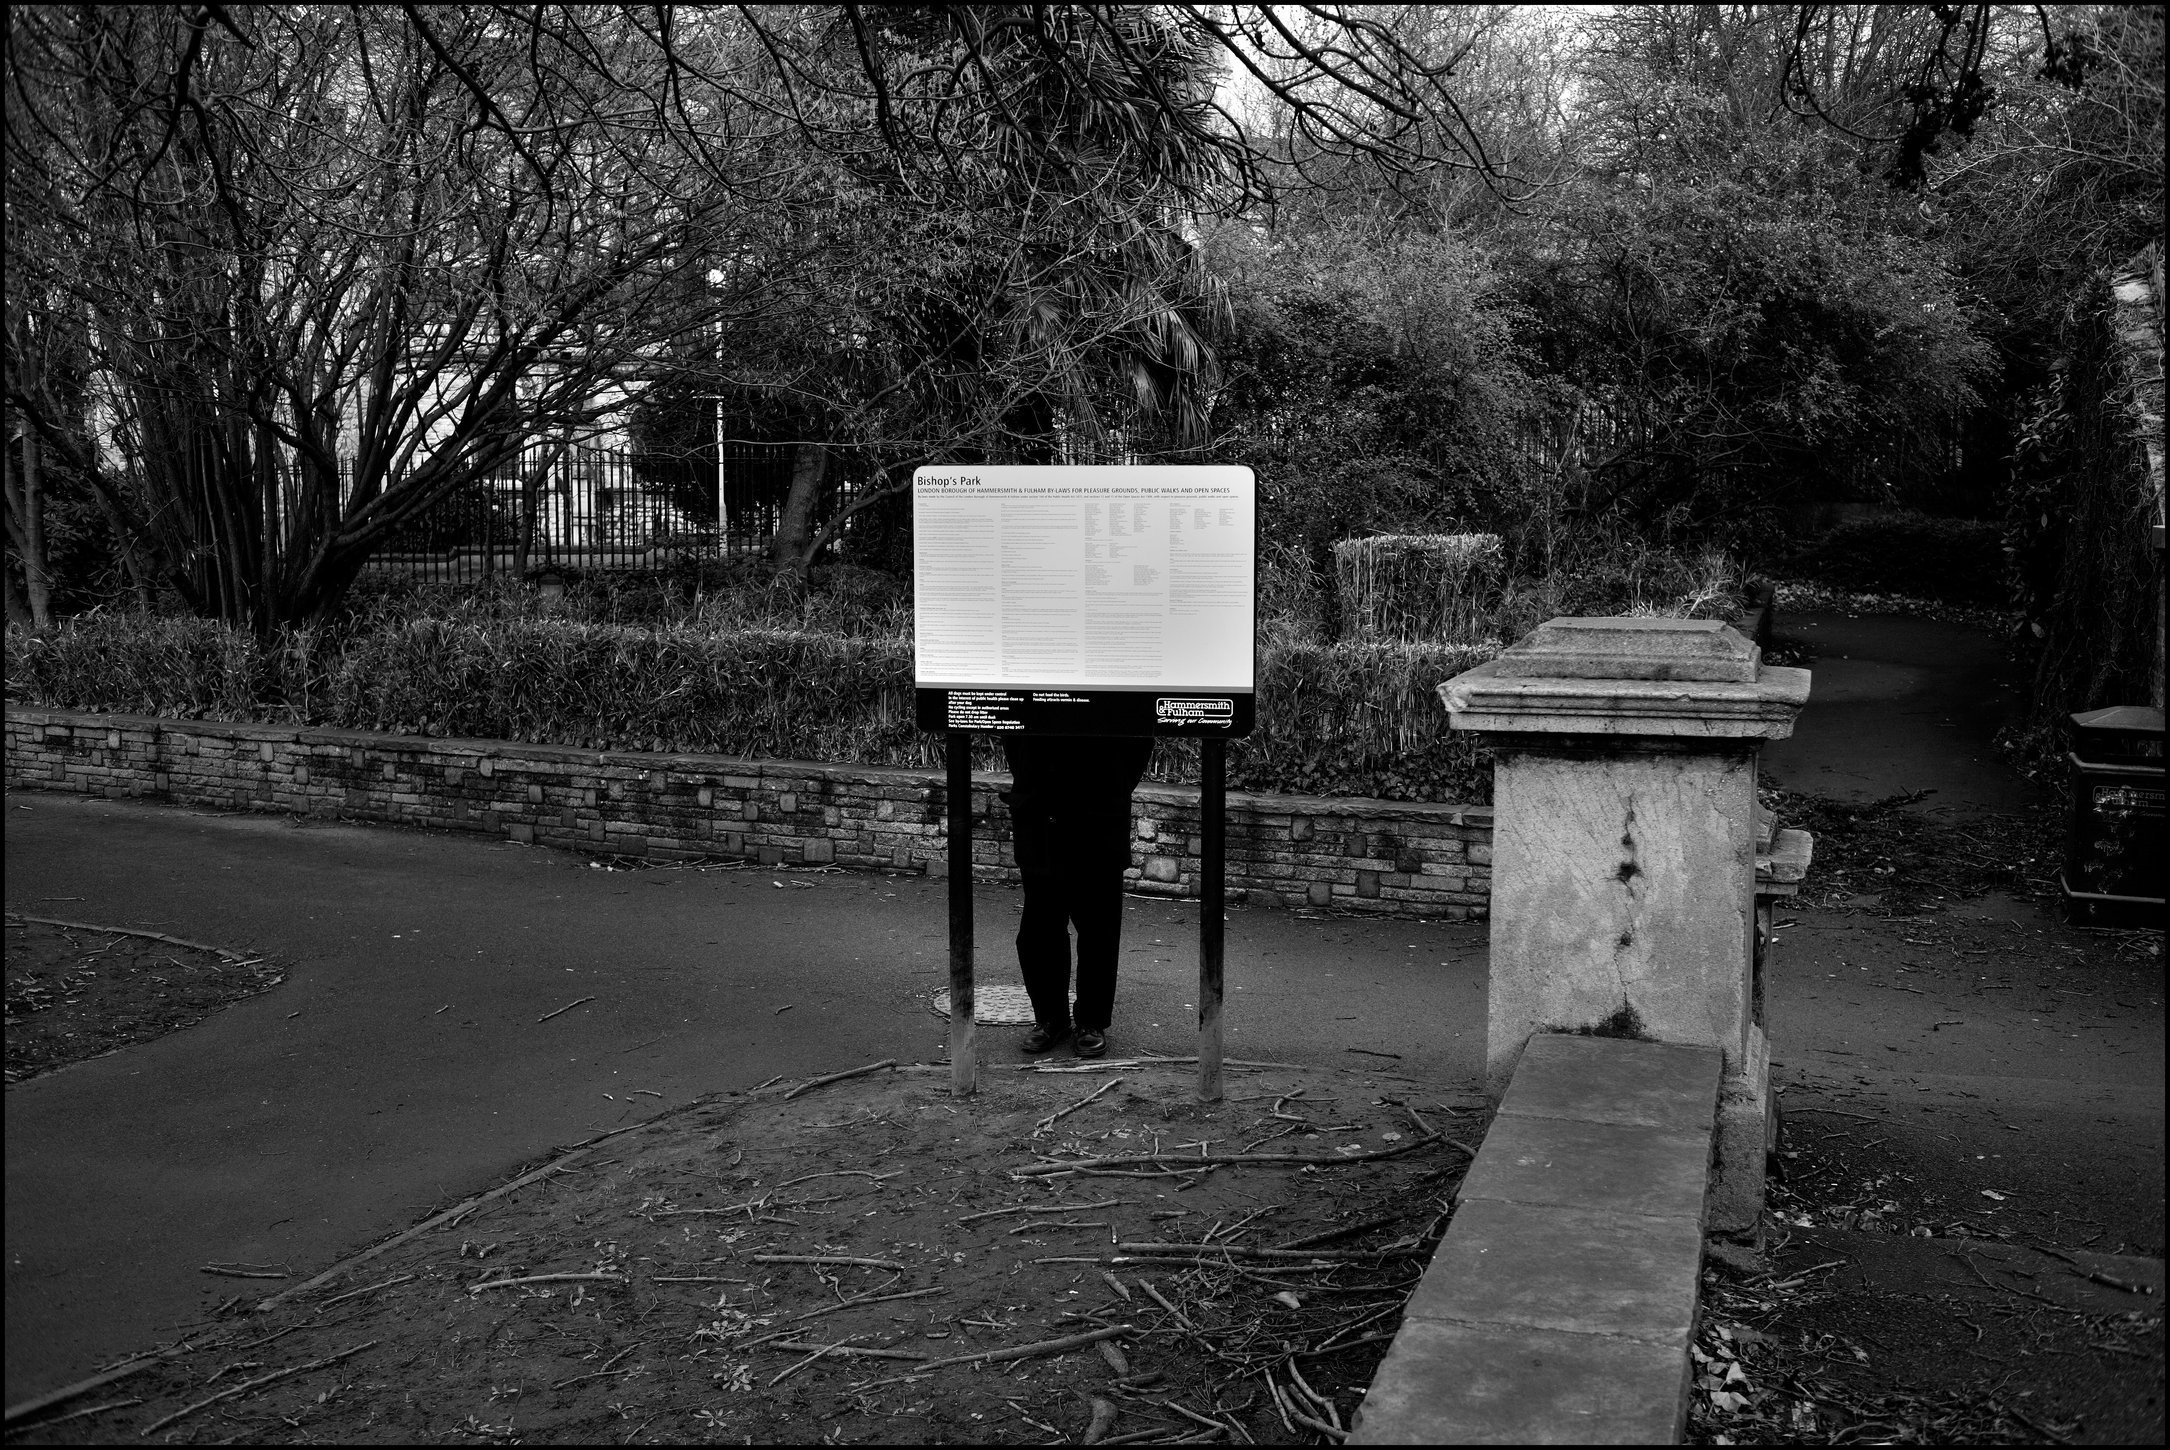 20070127_bishops_park_london.jpg